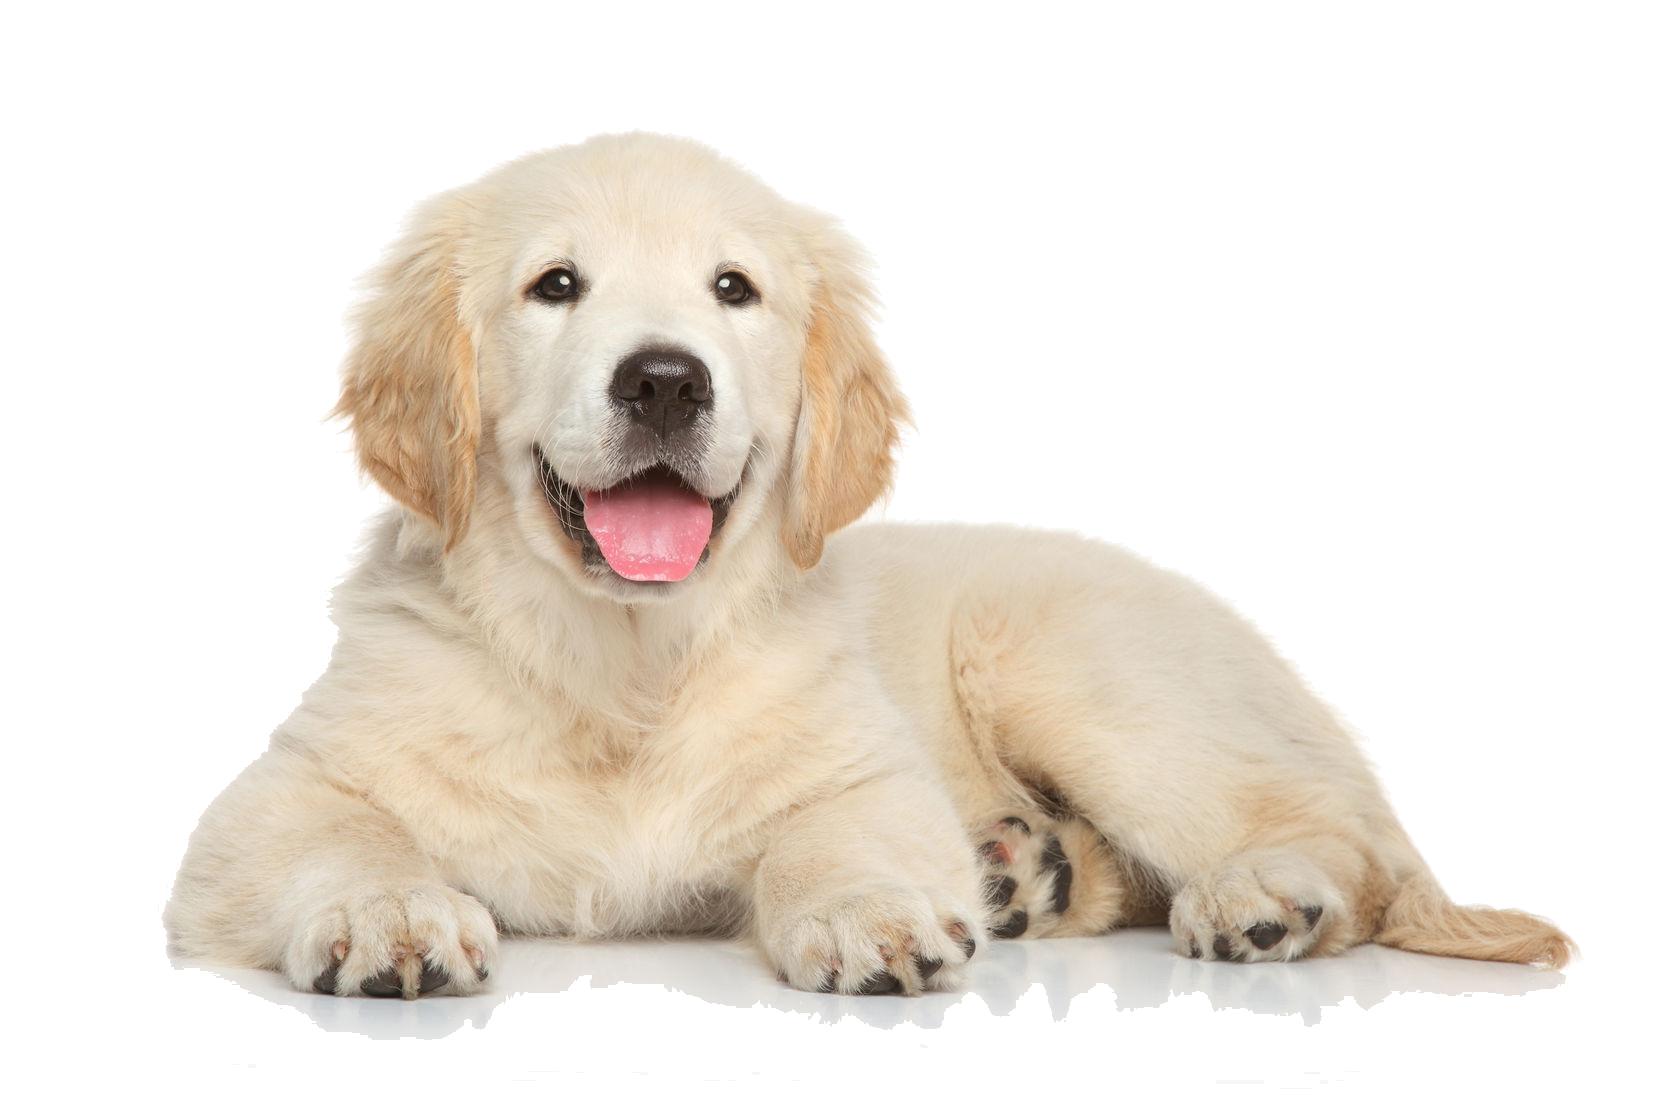 Clipart Puppy Golden Retriever Clipart Puppy Golden Retriever Transparent Free For Download On Webstockreview 2020